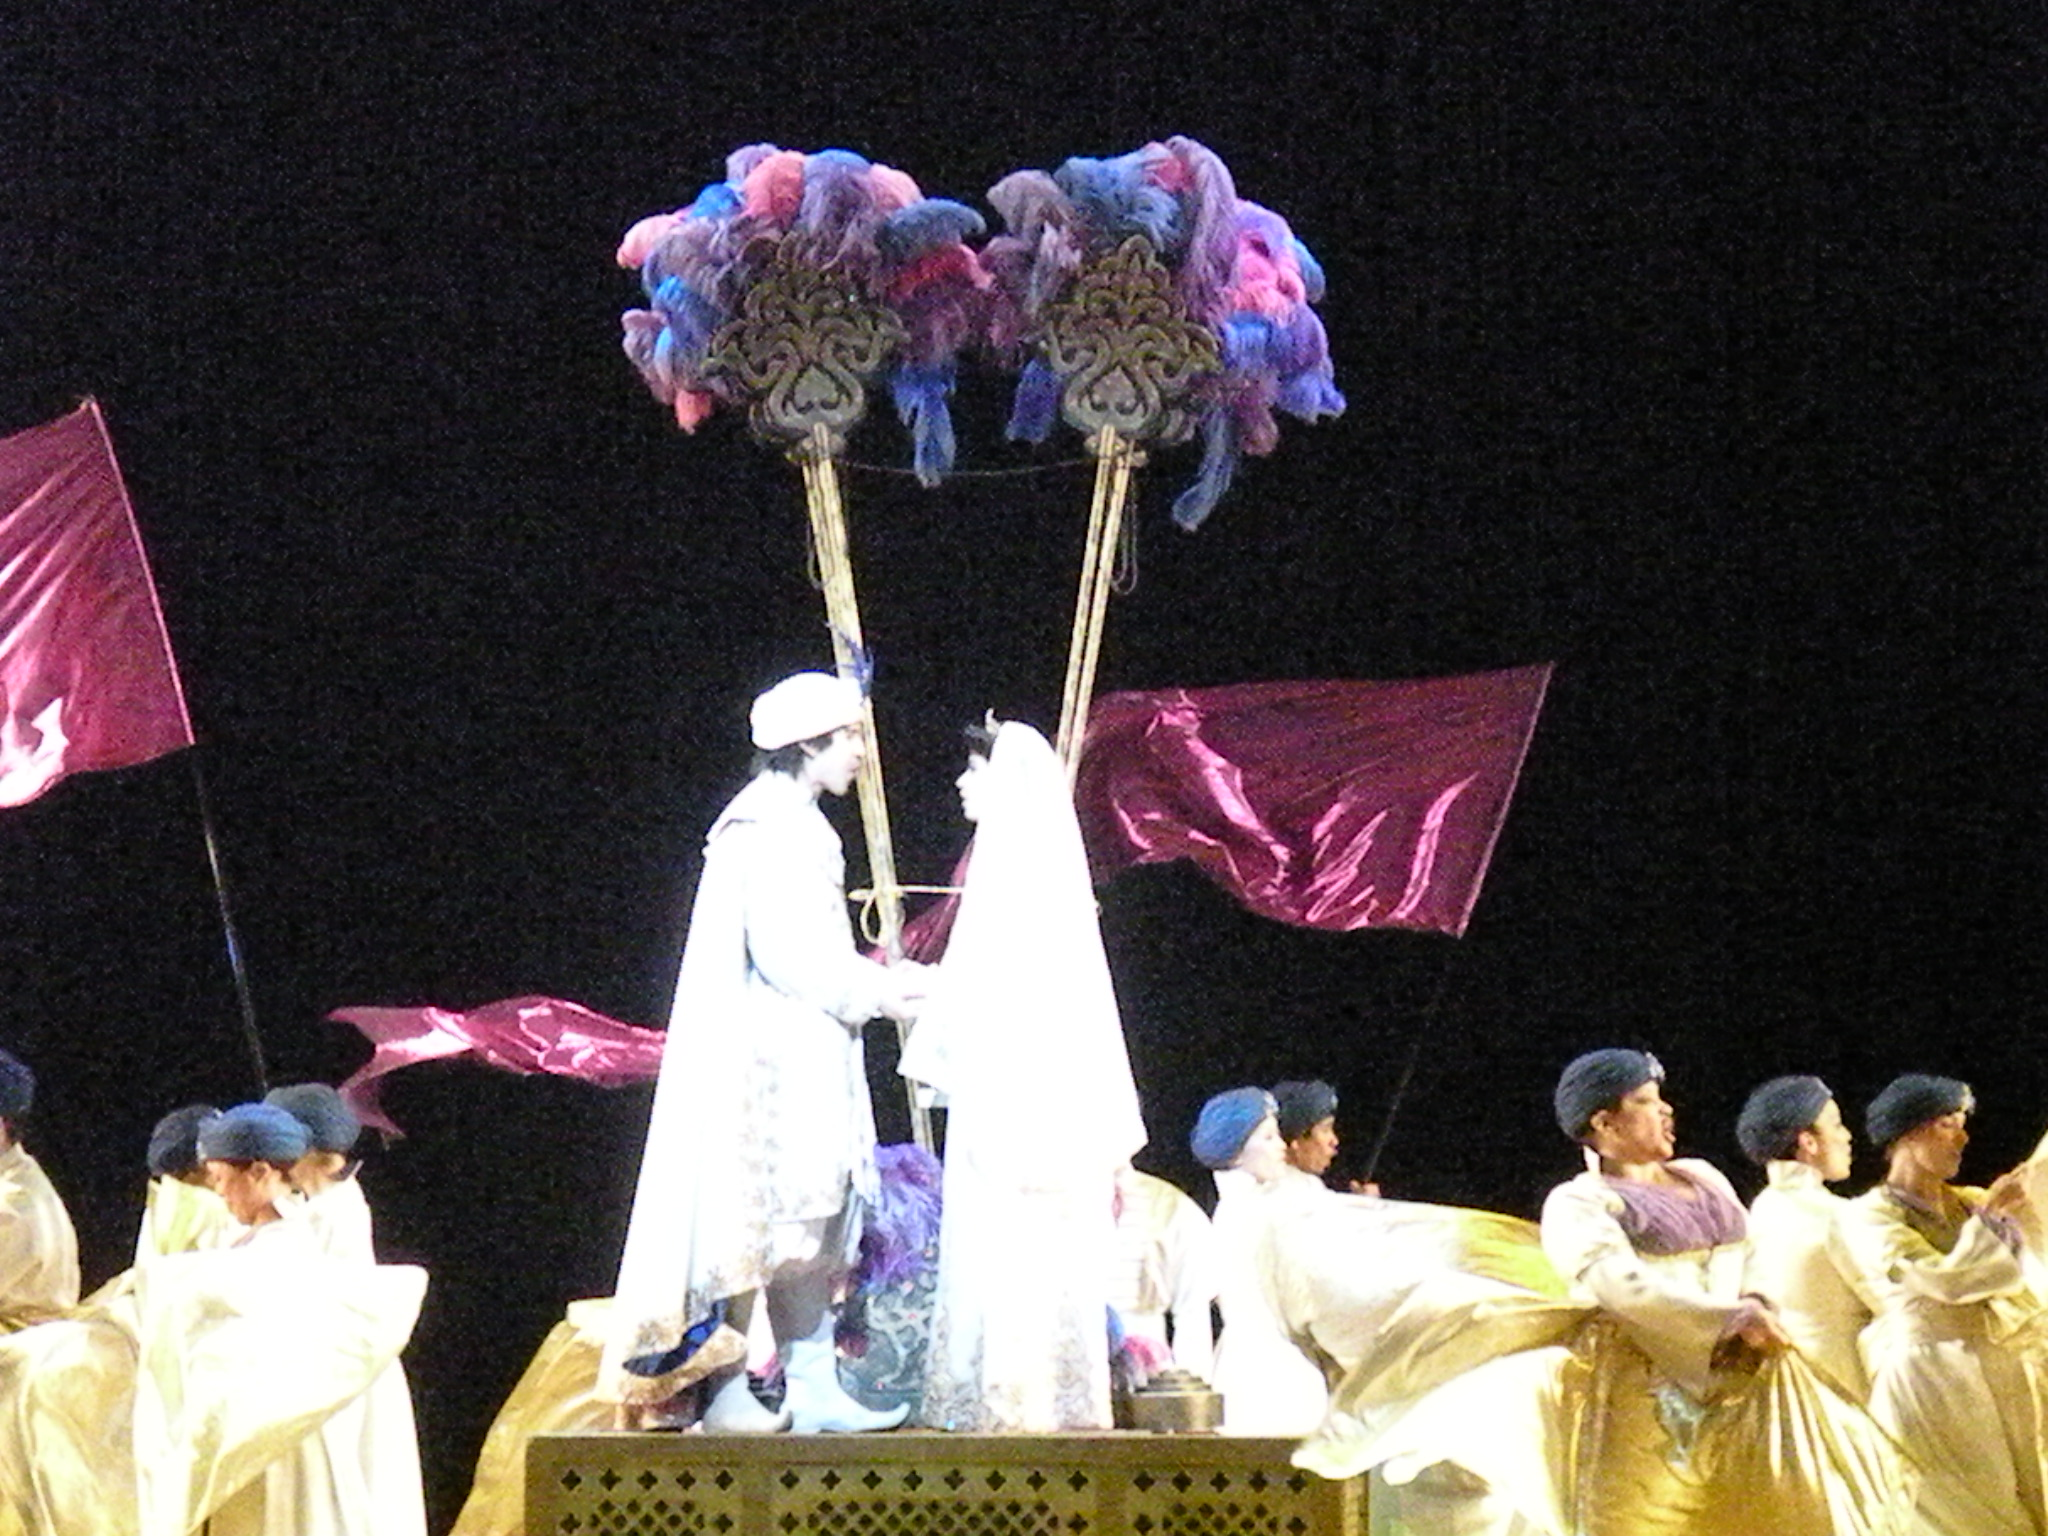 Princess Jasmine chooses Aladdin.